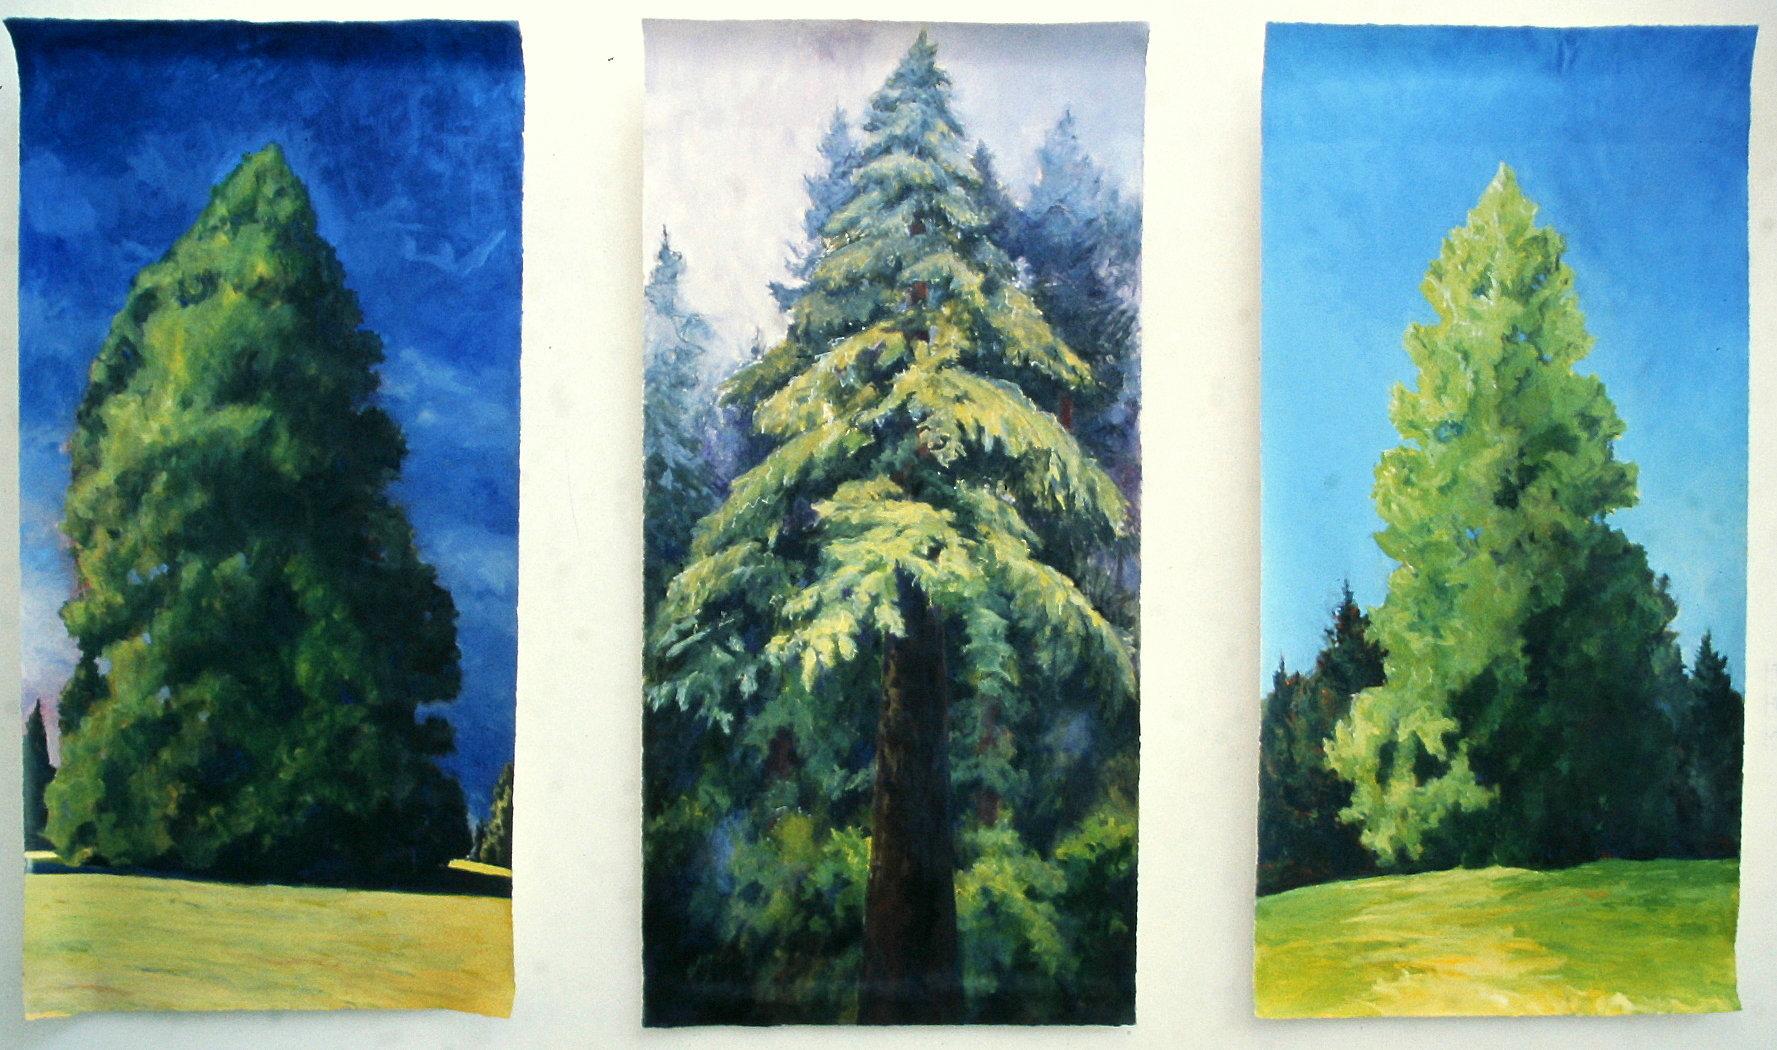 Tree Portraits, Installation